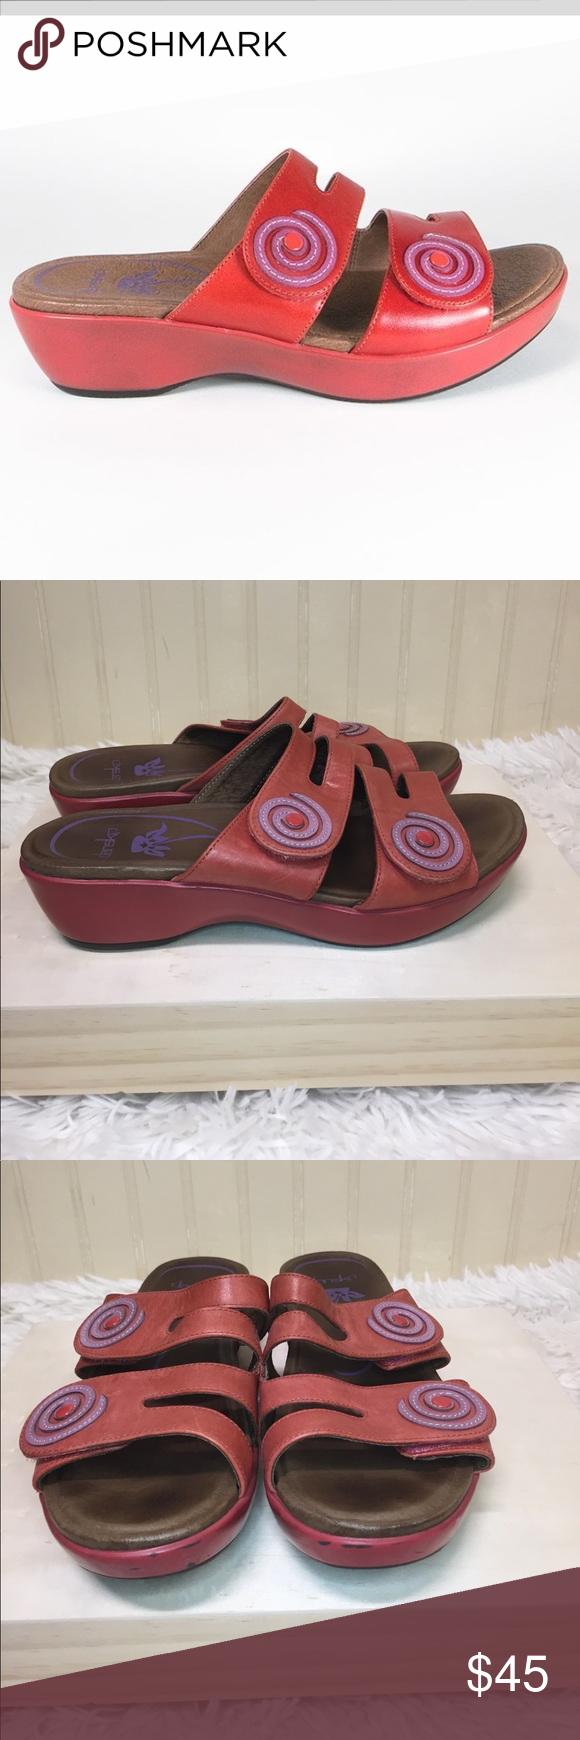 e6061f208d Dansko Dixie dress sandals size 38